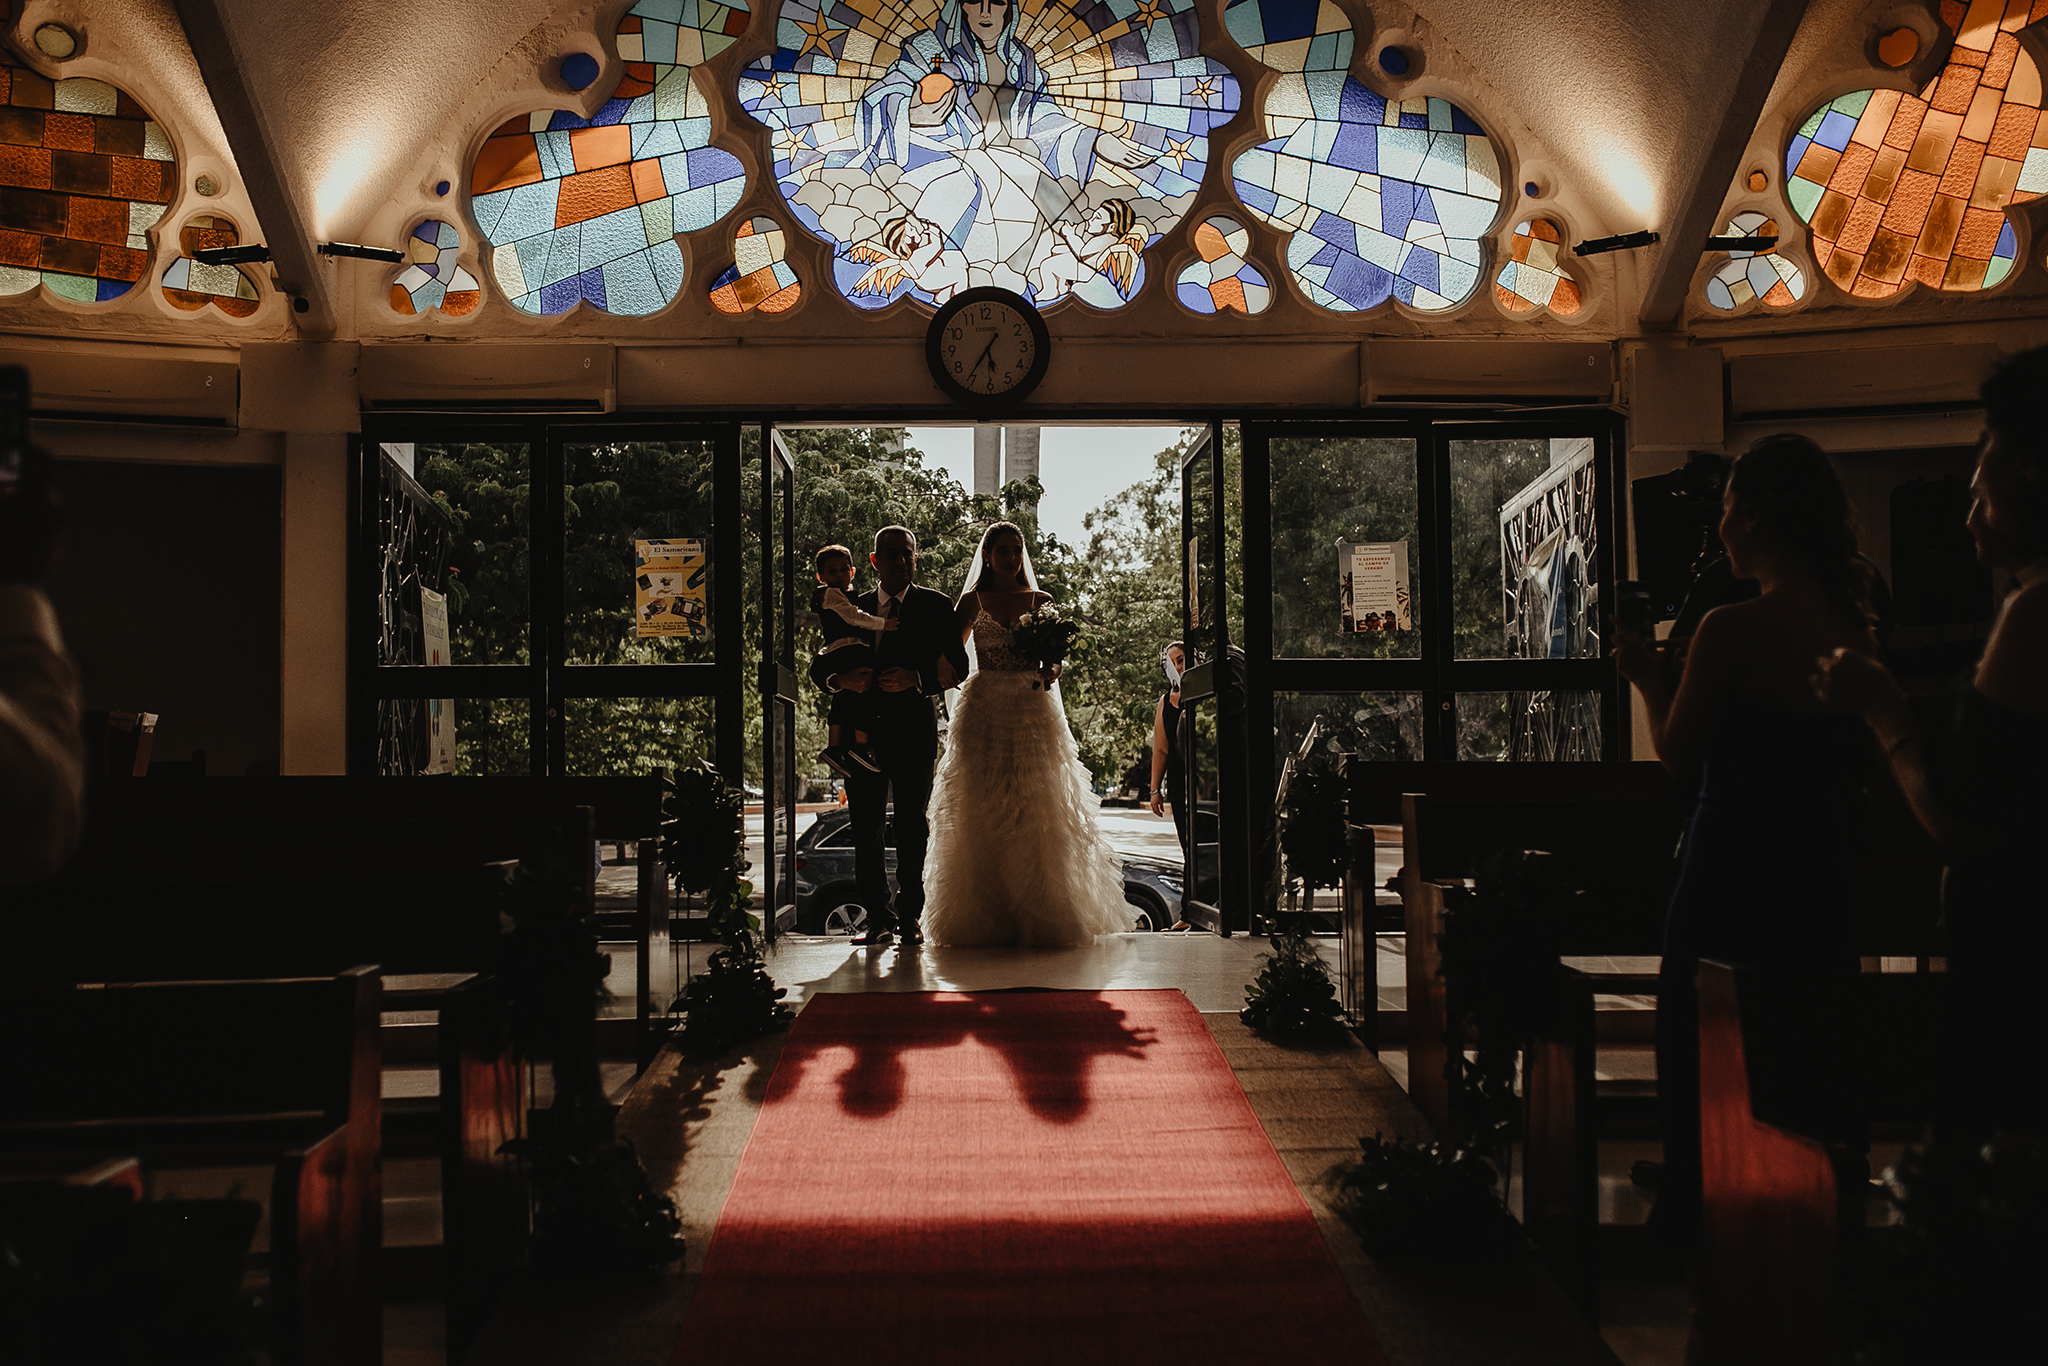 0568R&F__WeddingDestination_Weddingmerida_BodaMexico_FotografoDeBodas_FabrizioSimoneenFotografo.jpg